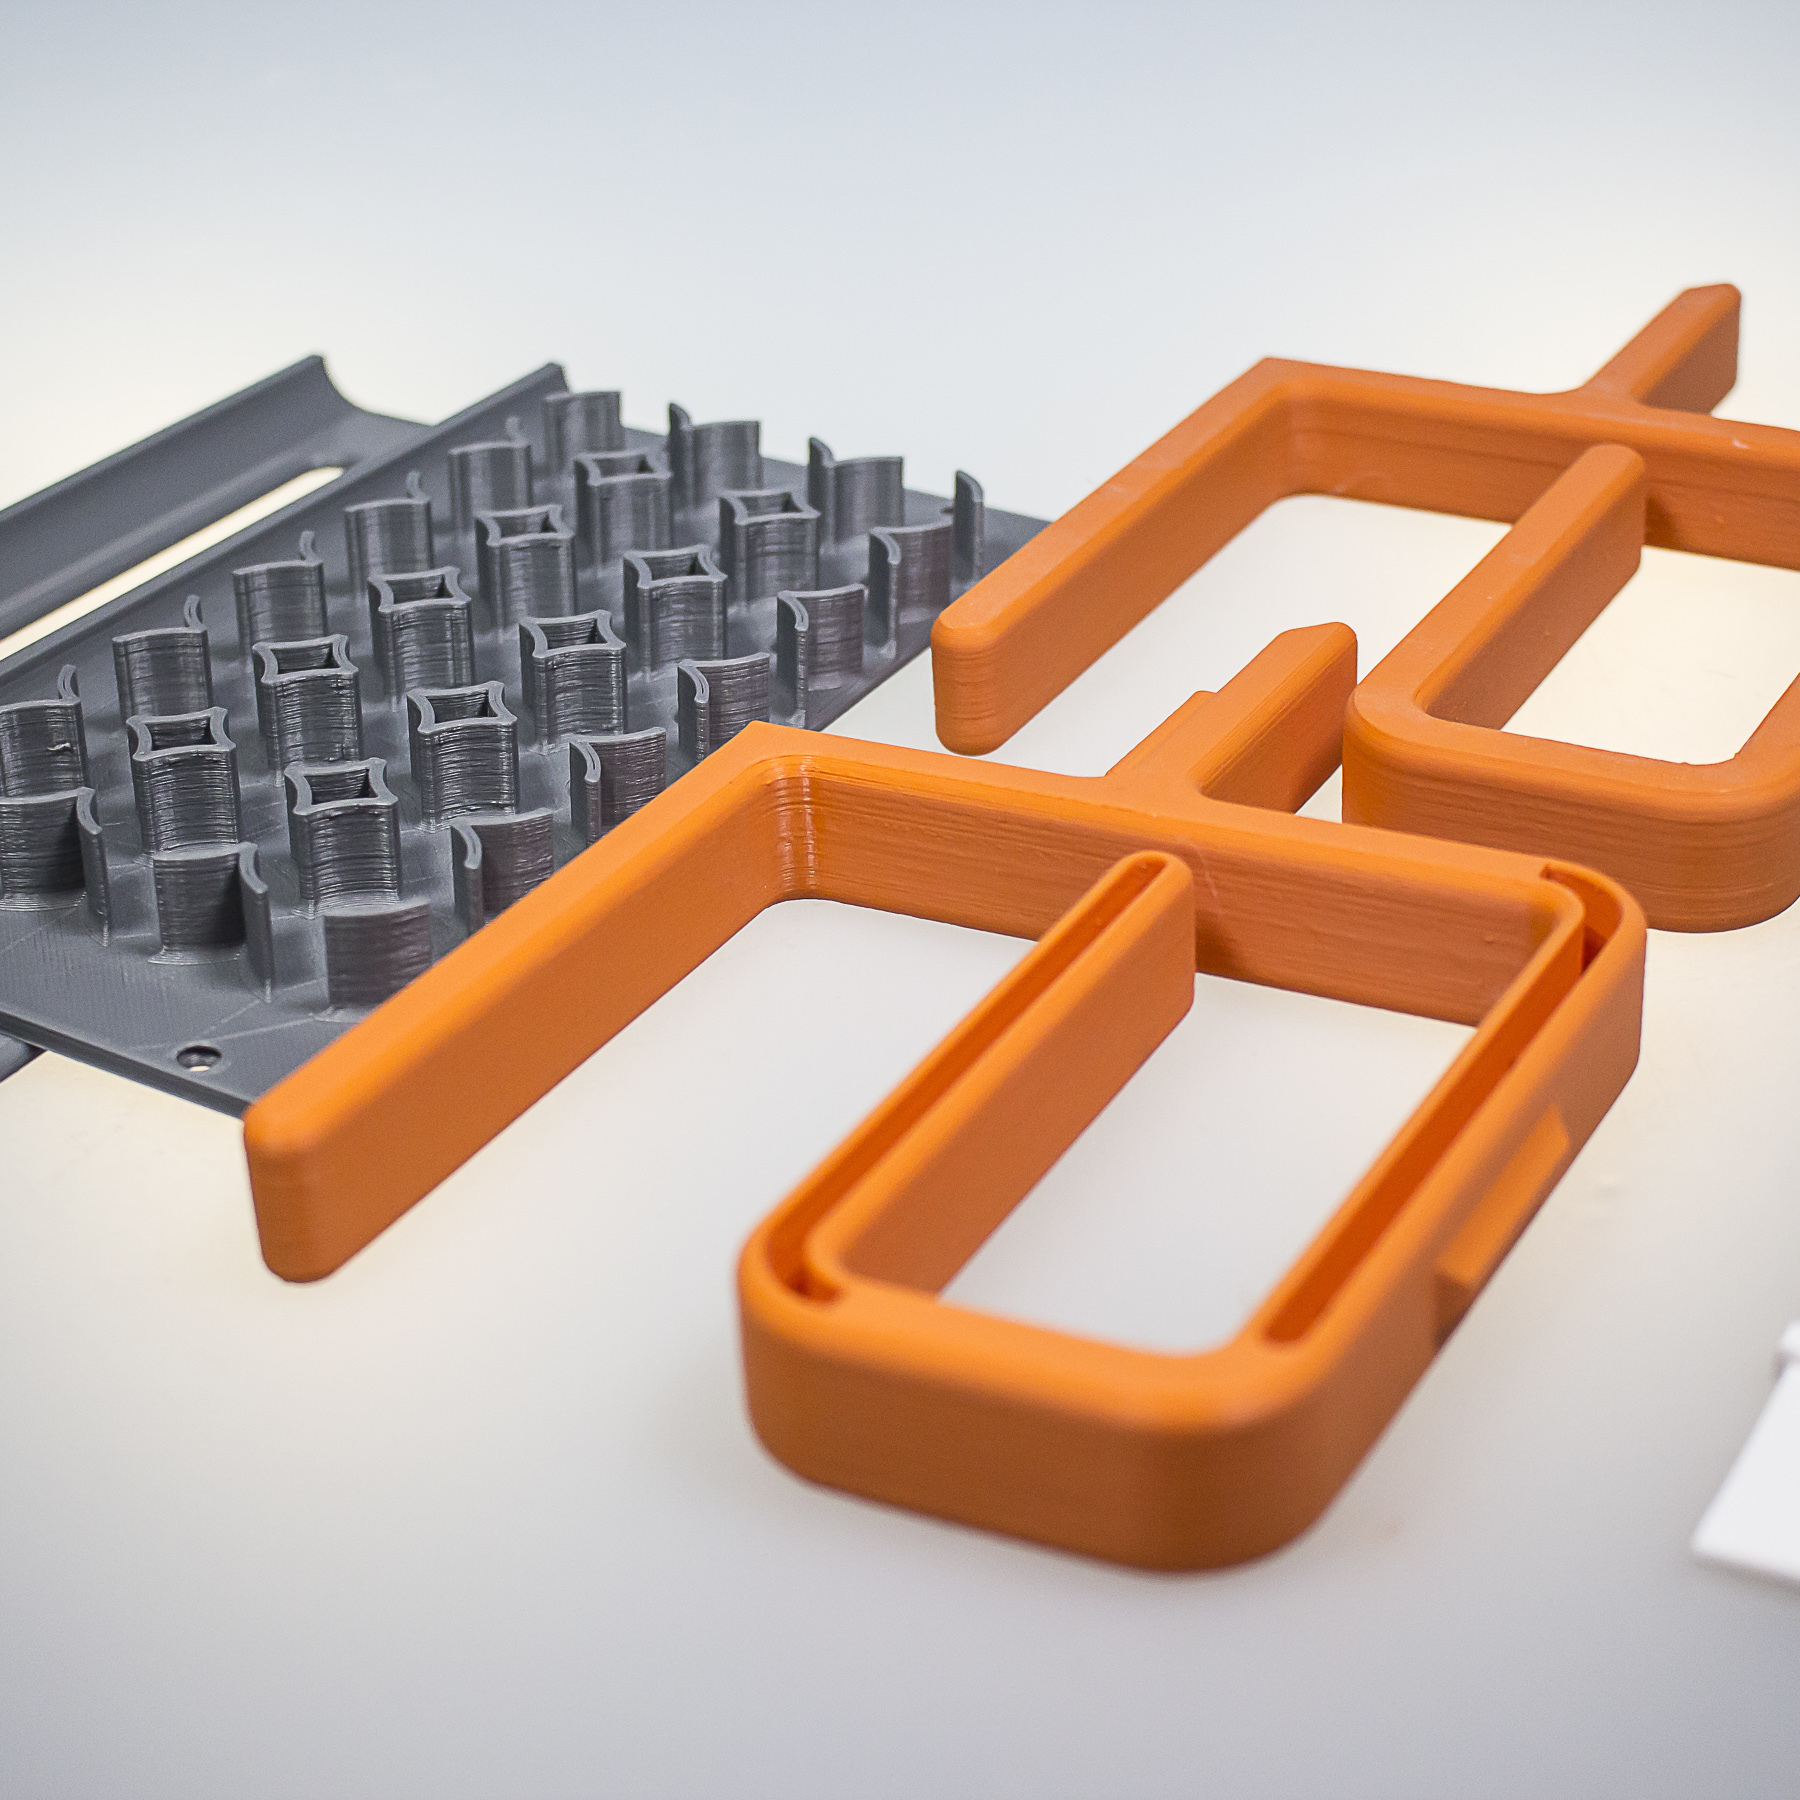 _MG_1971.jpg Download STL file Inkynato • 3D print design, CKLab